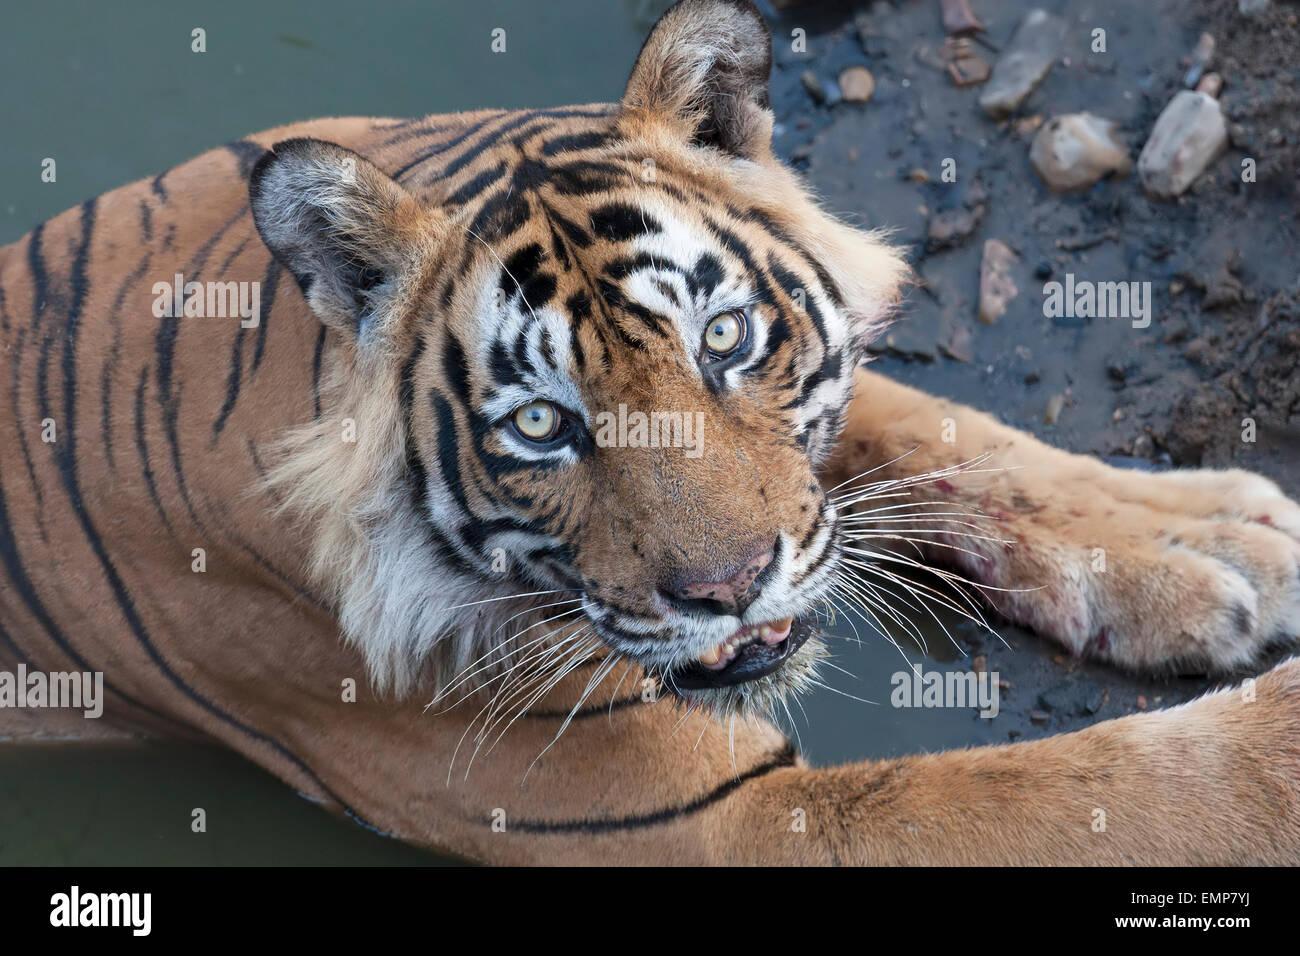 Royal Bengal Tiger or Panthera tigris tigris in water body at Rahthambhore National Park Rajasthan India - Stock Image